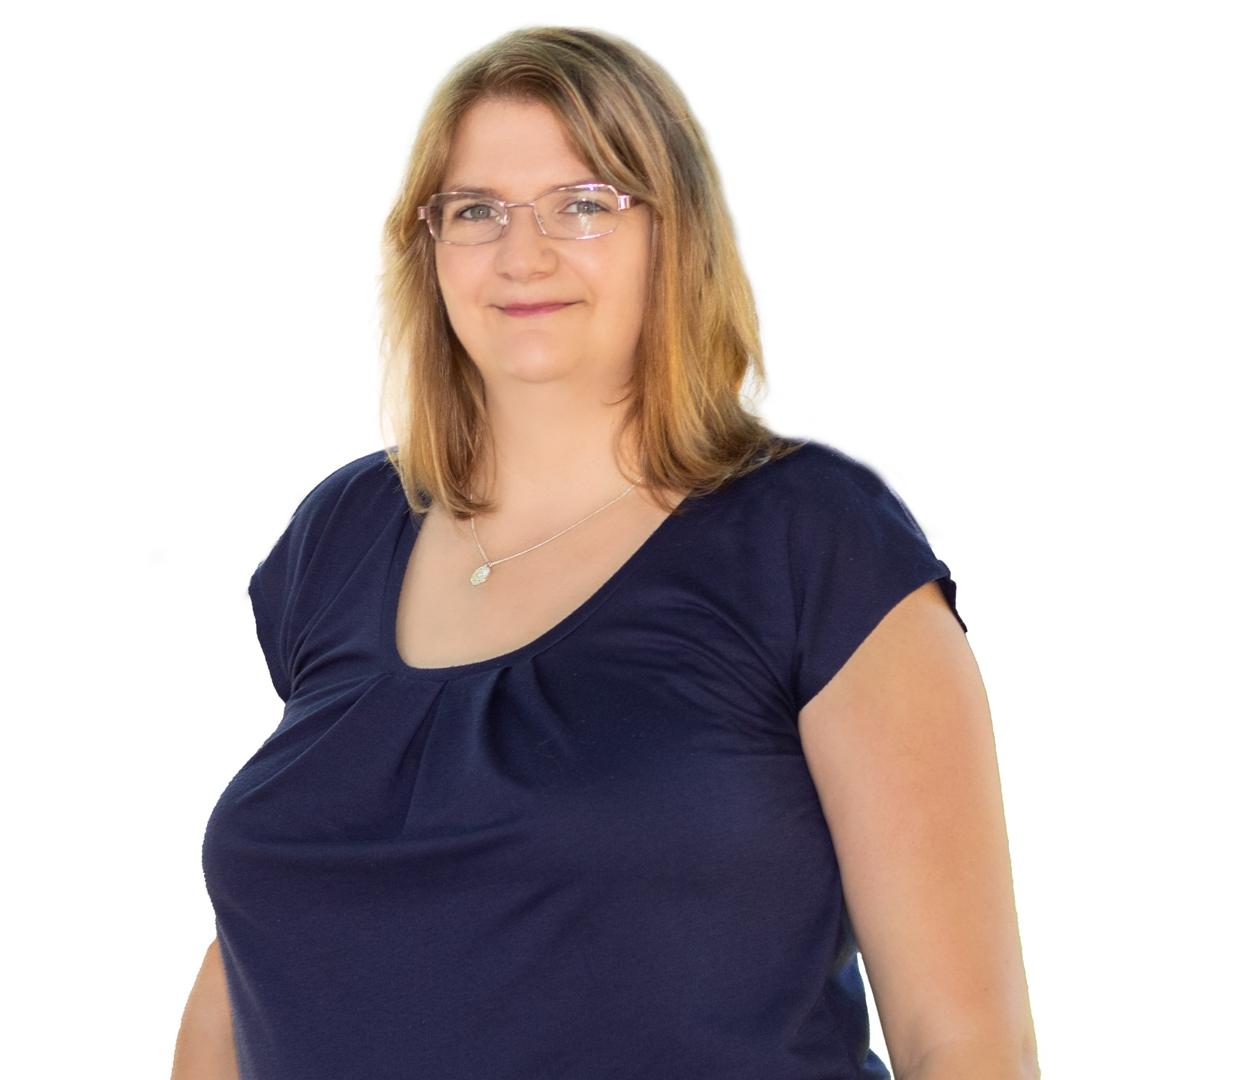 Jessica Perregaux-Dielf